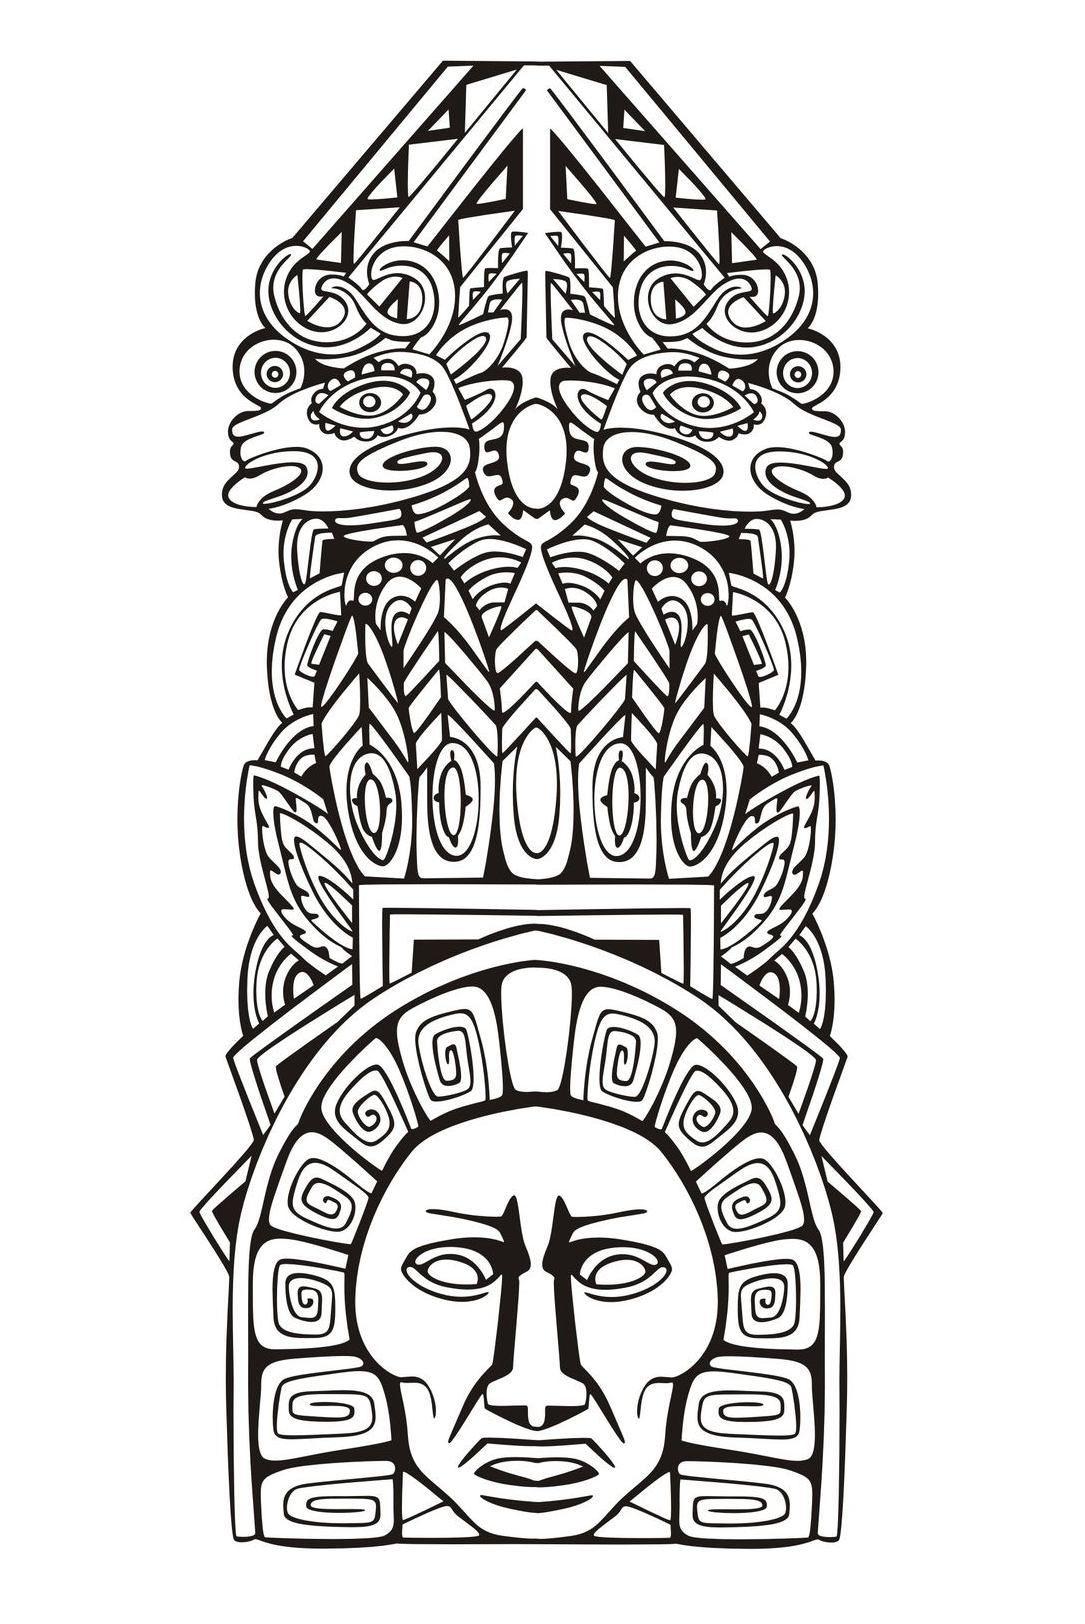 aztec coloring pages - photo#26